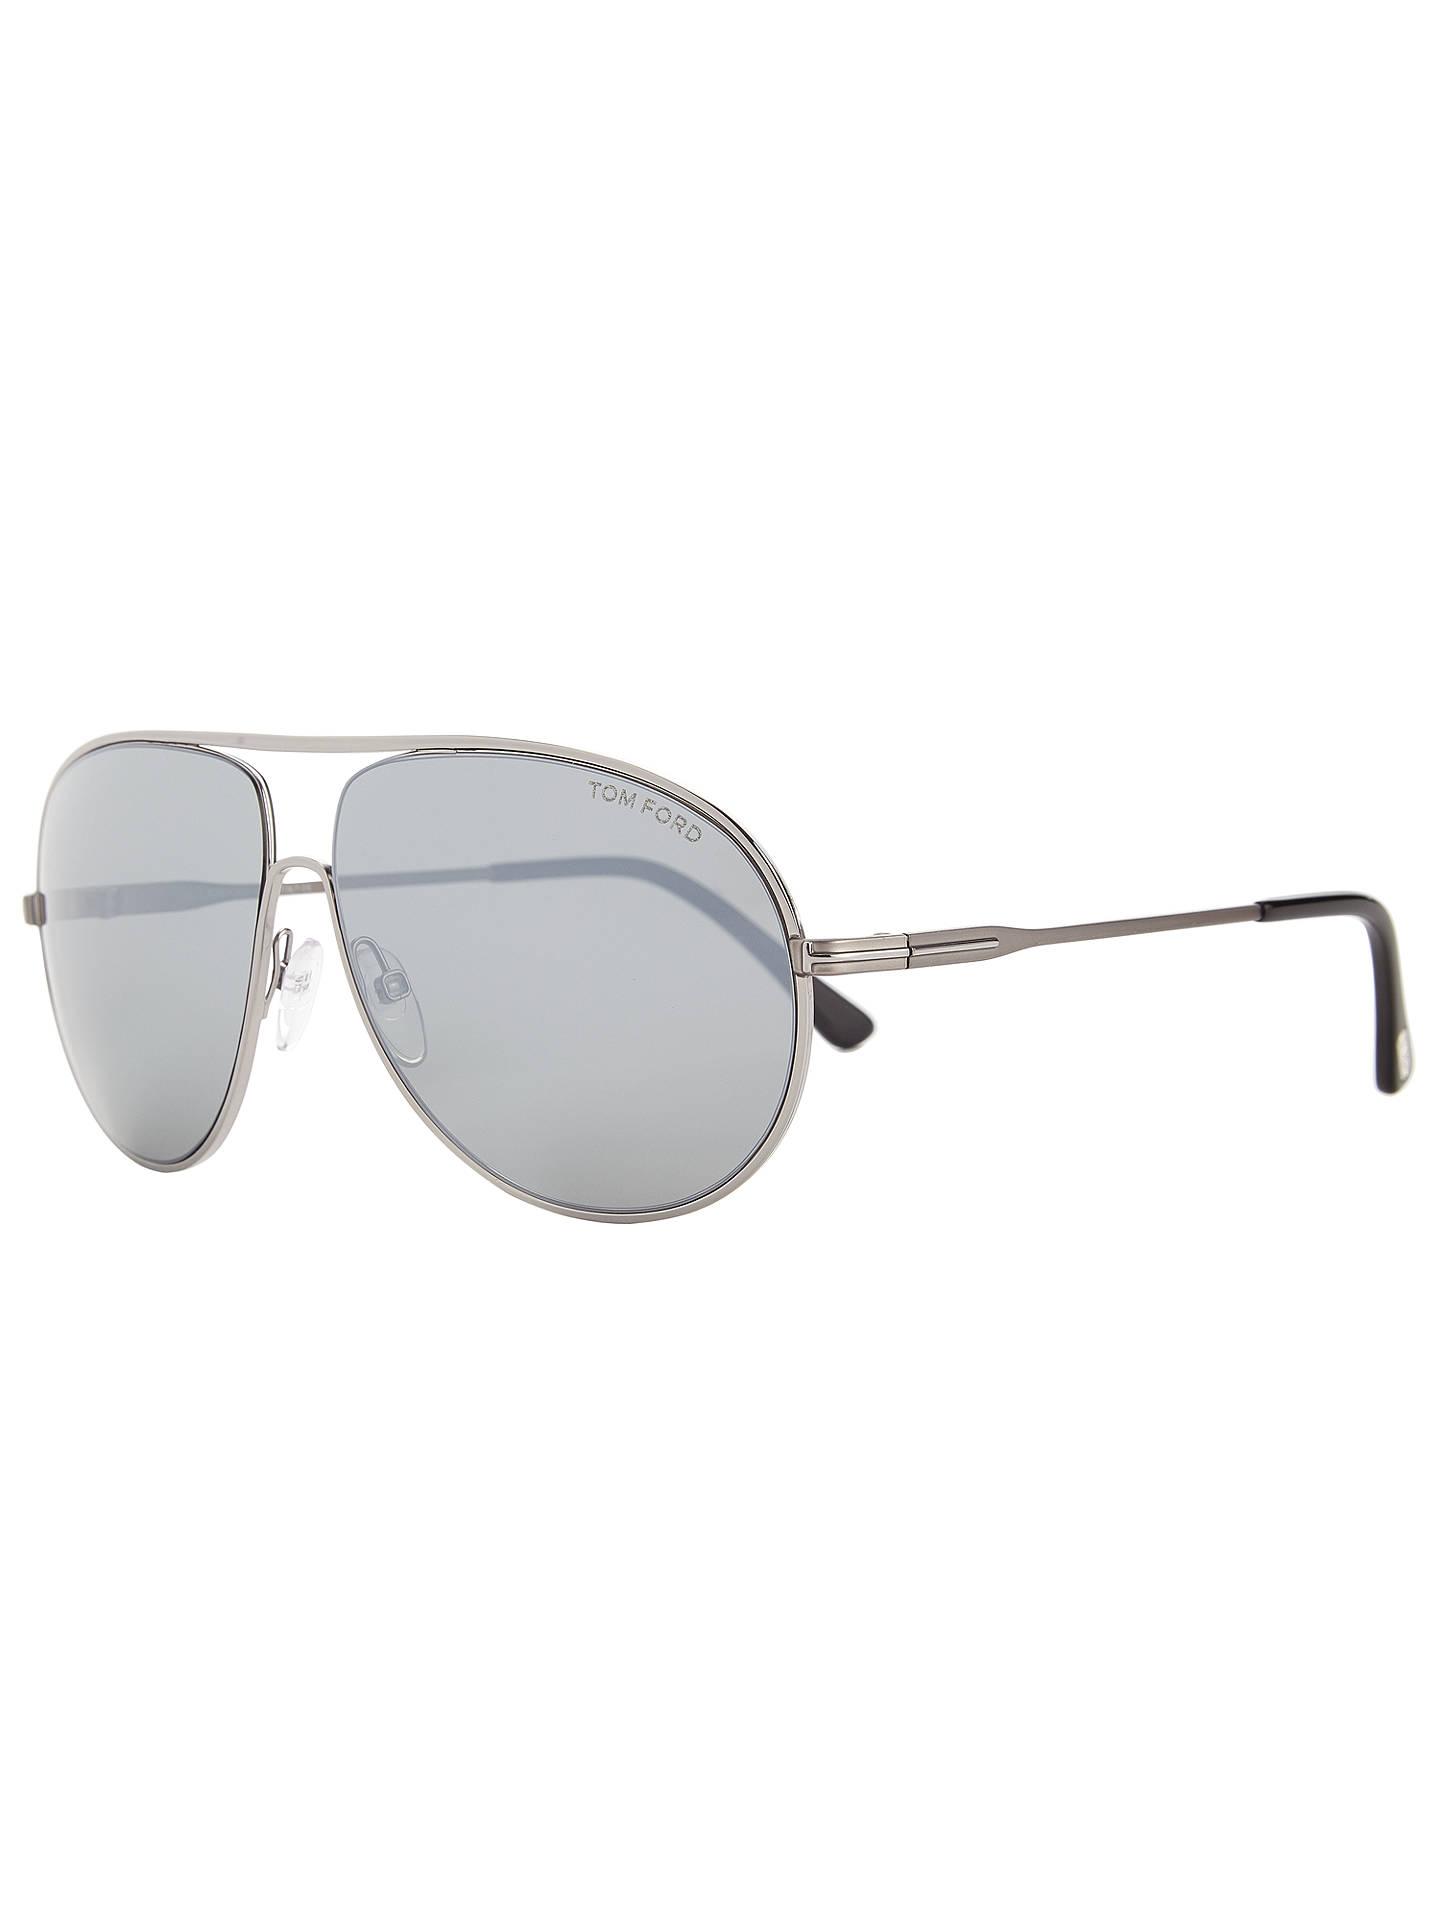 55554464ba TOM FORD FT0450 Cliff Aviator Sunglasses at John Lewis   Partners